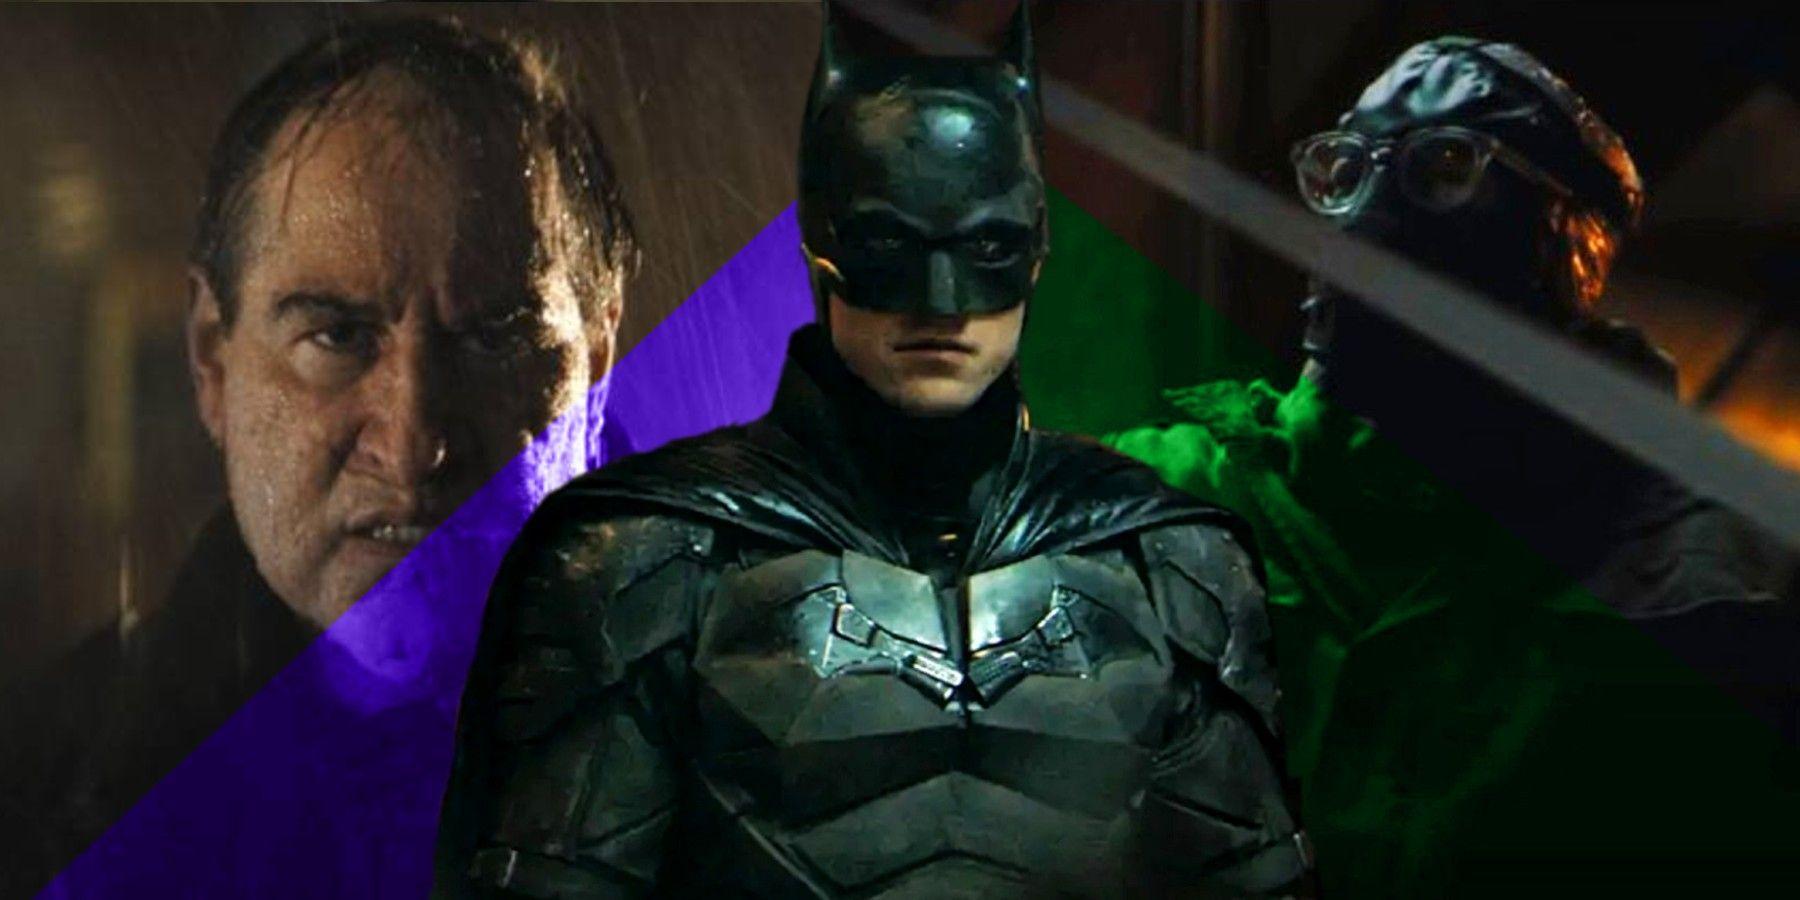 The Batman's Year 2 Setting Risks Creating A Villain Problem